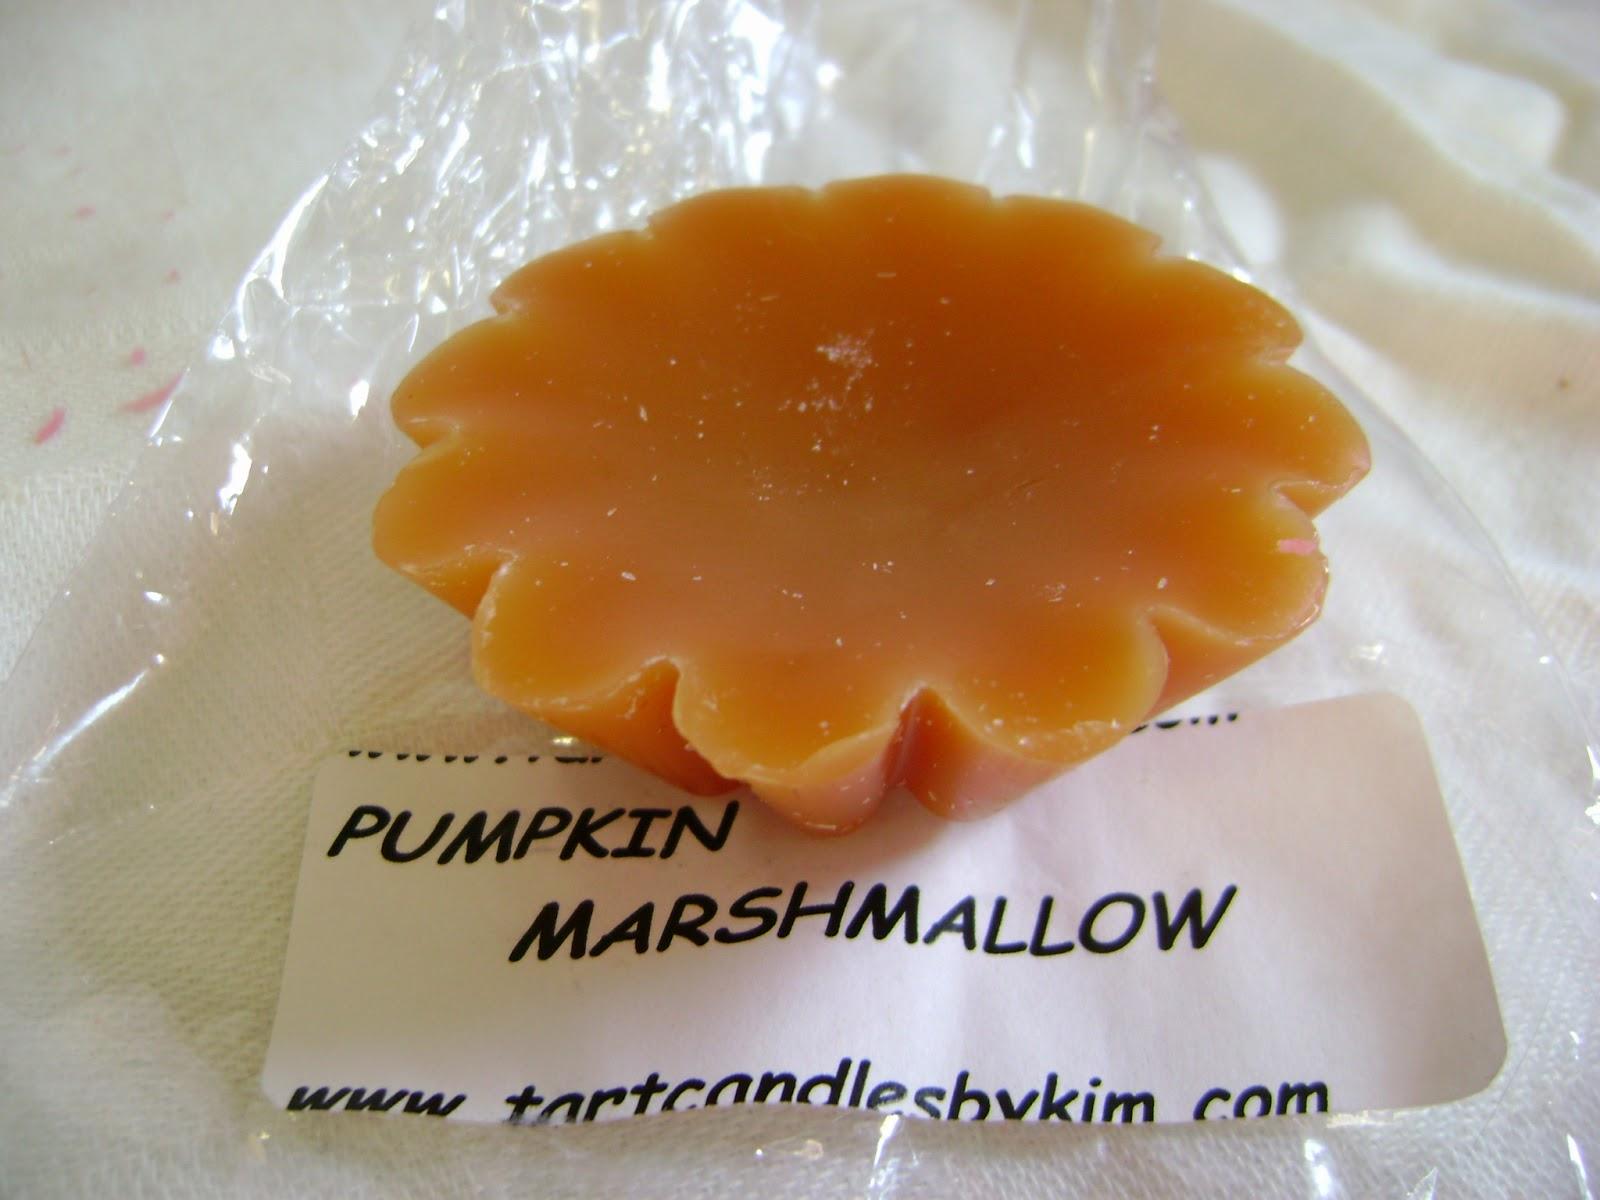 Cardamom, cinnamon, marshmallow, cooked pumpkin, Madagascar vanilla ...